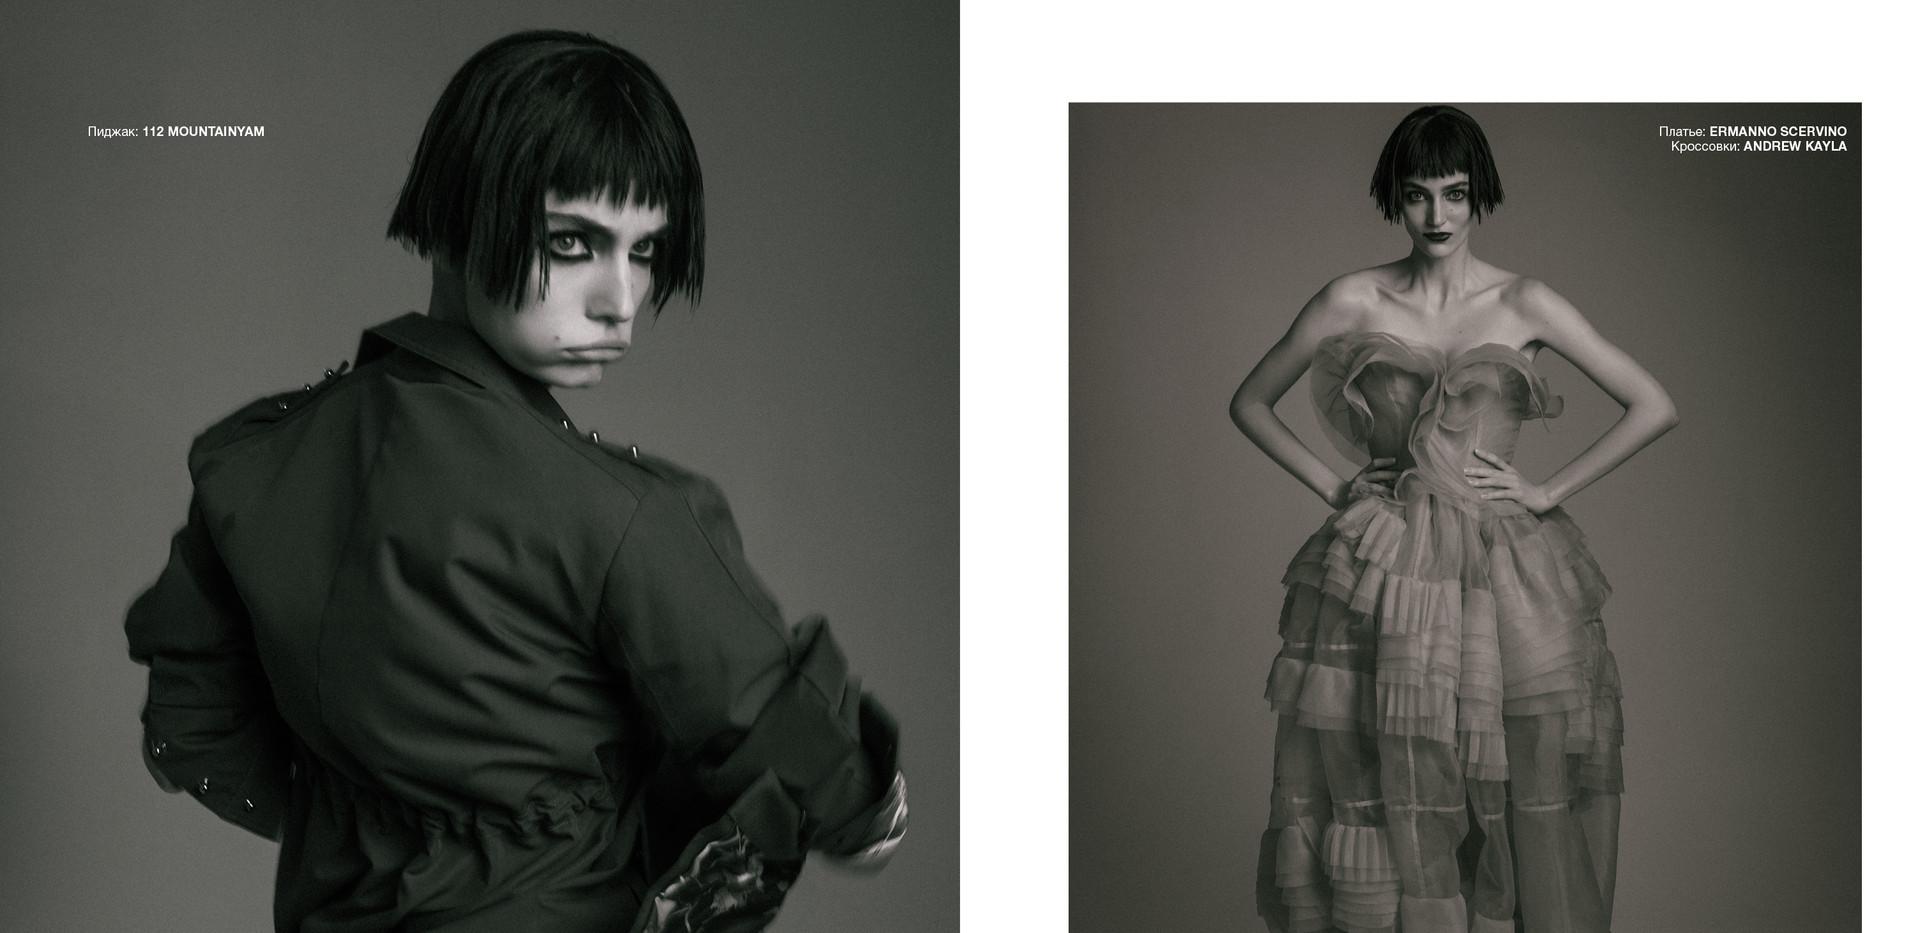 Photo: Juankr Magazine: Númerorussia 54 Work: Noir Desir Model: Zuzanna Bljoch